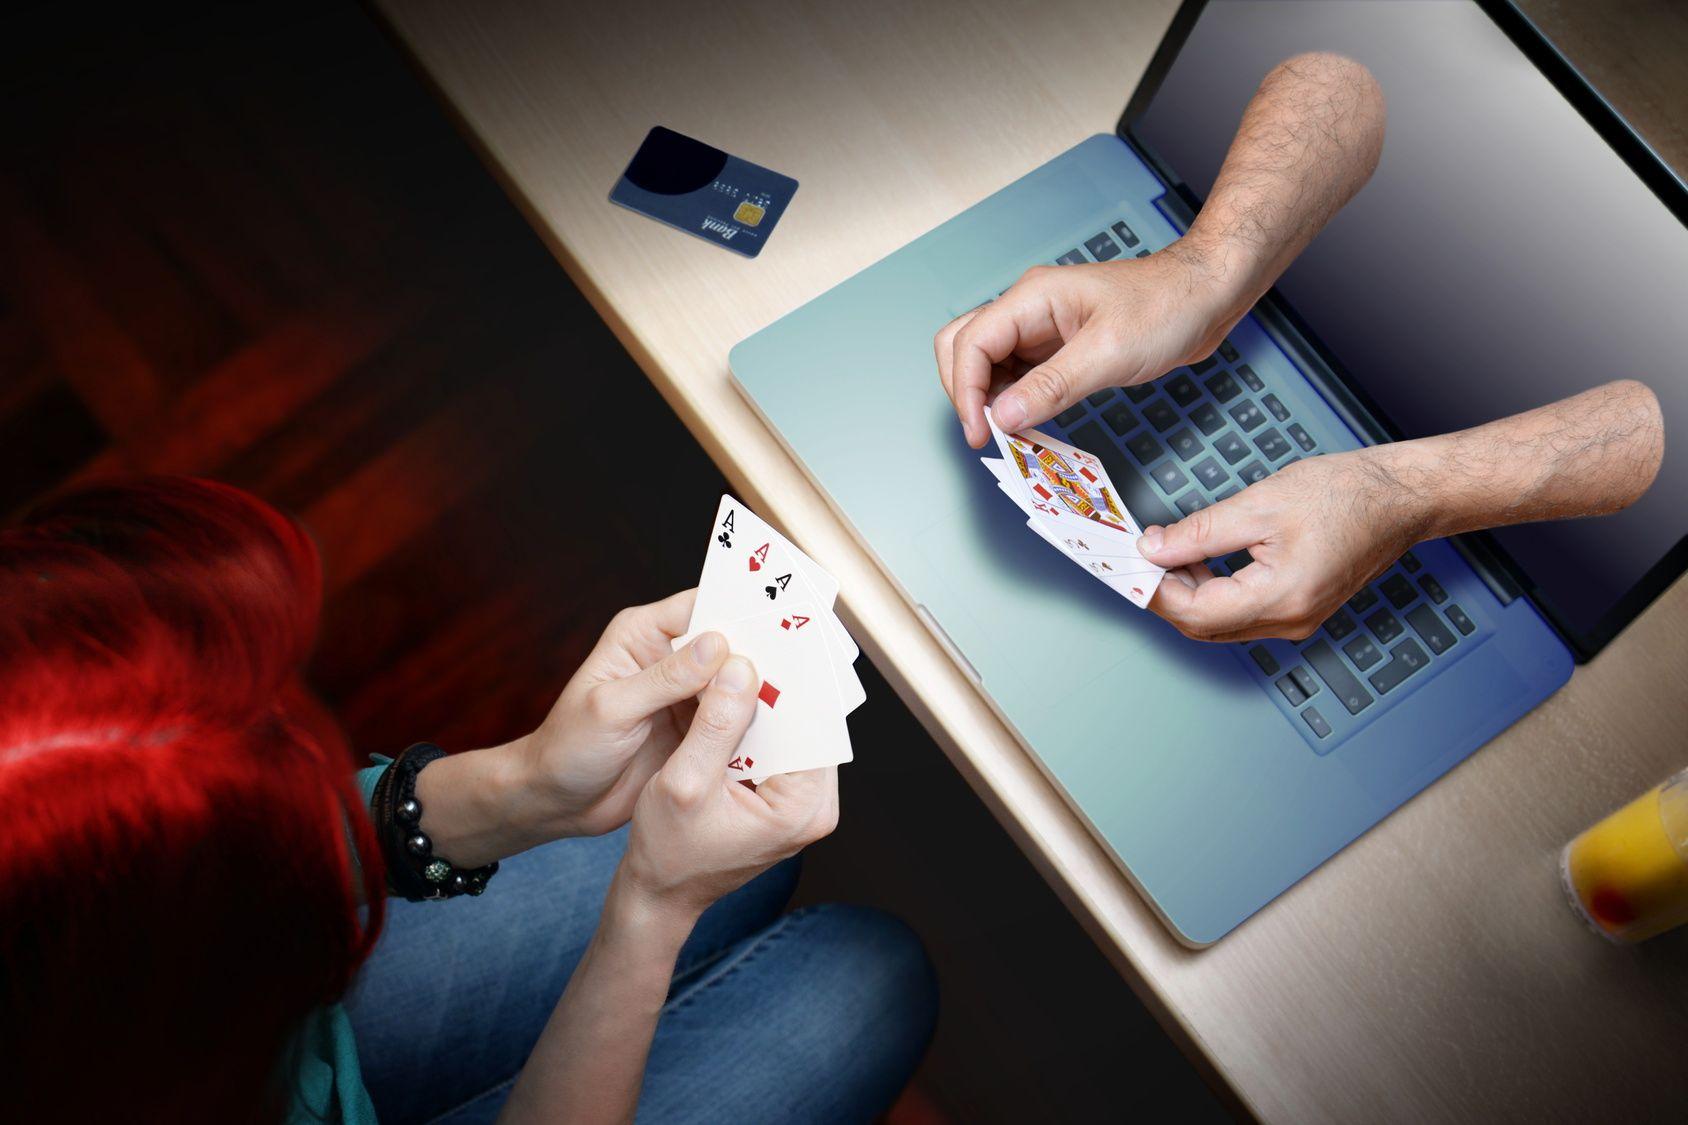 Khuyến mãi 15 BetSoft Freispins khi cập nhật hồ sơ Fun88 | casino online